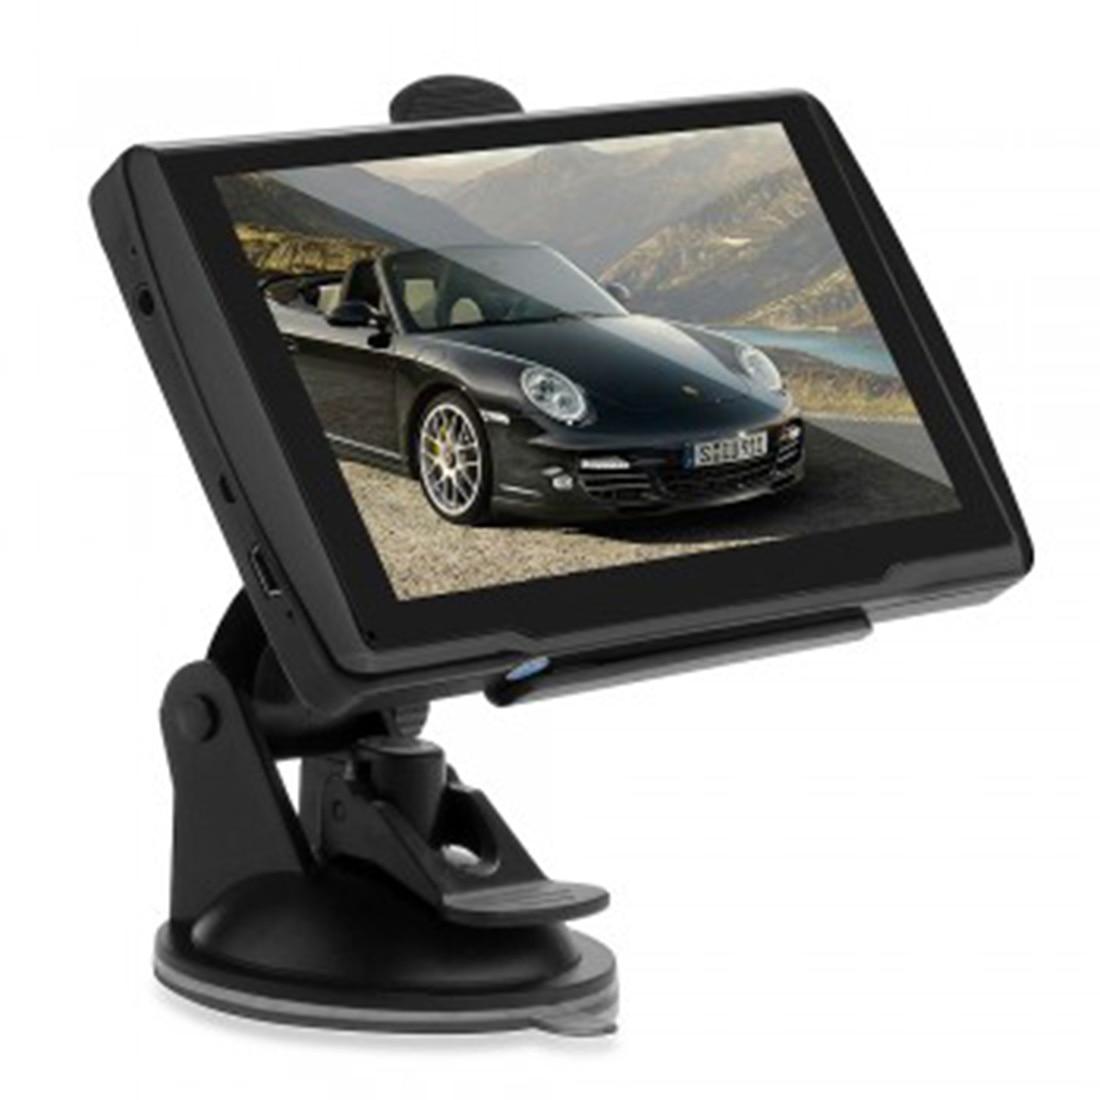 Car font b gps b font 5 inch Touch Screen font b GPS b font Navigation